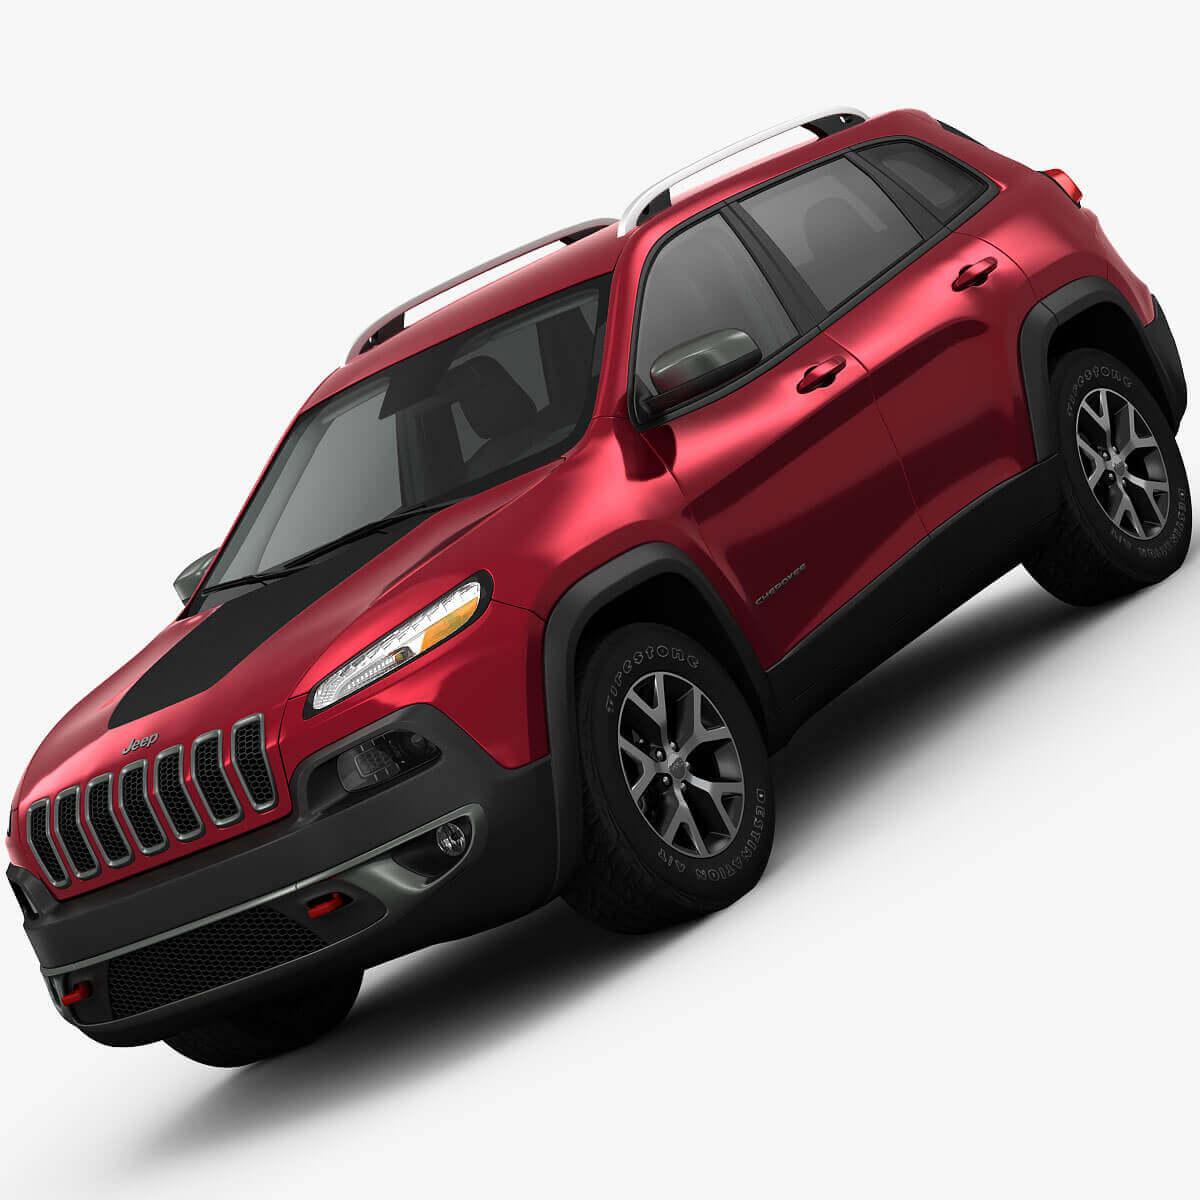 kit jeep newer kl new winch kits bumper trailhawk cherokee and